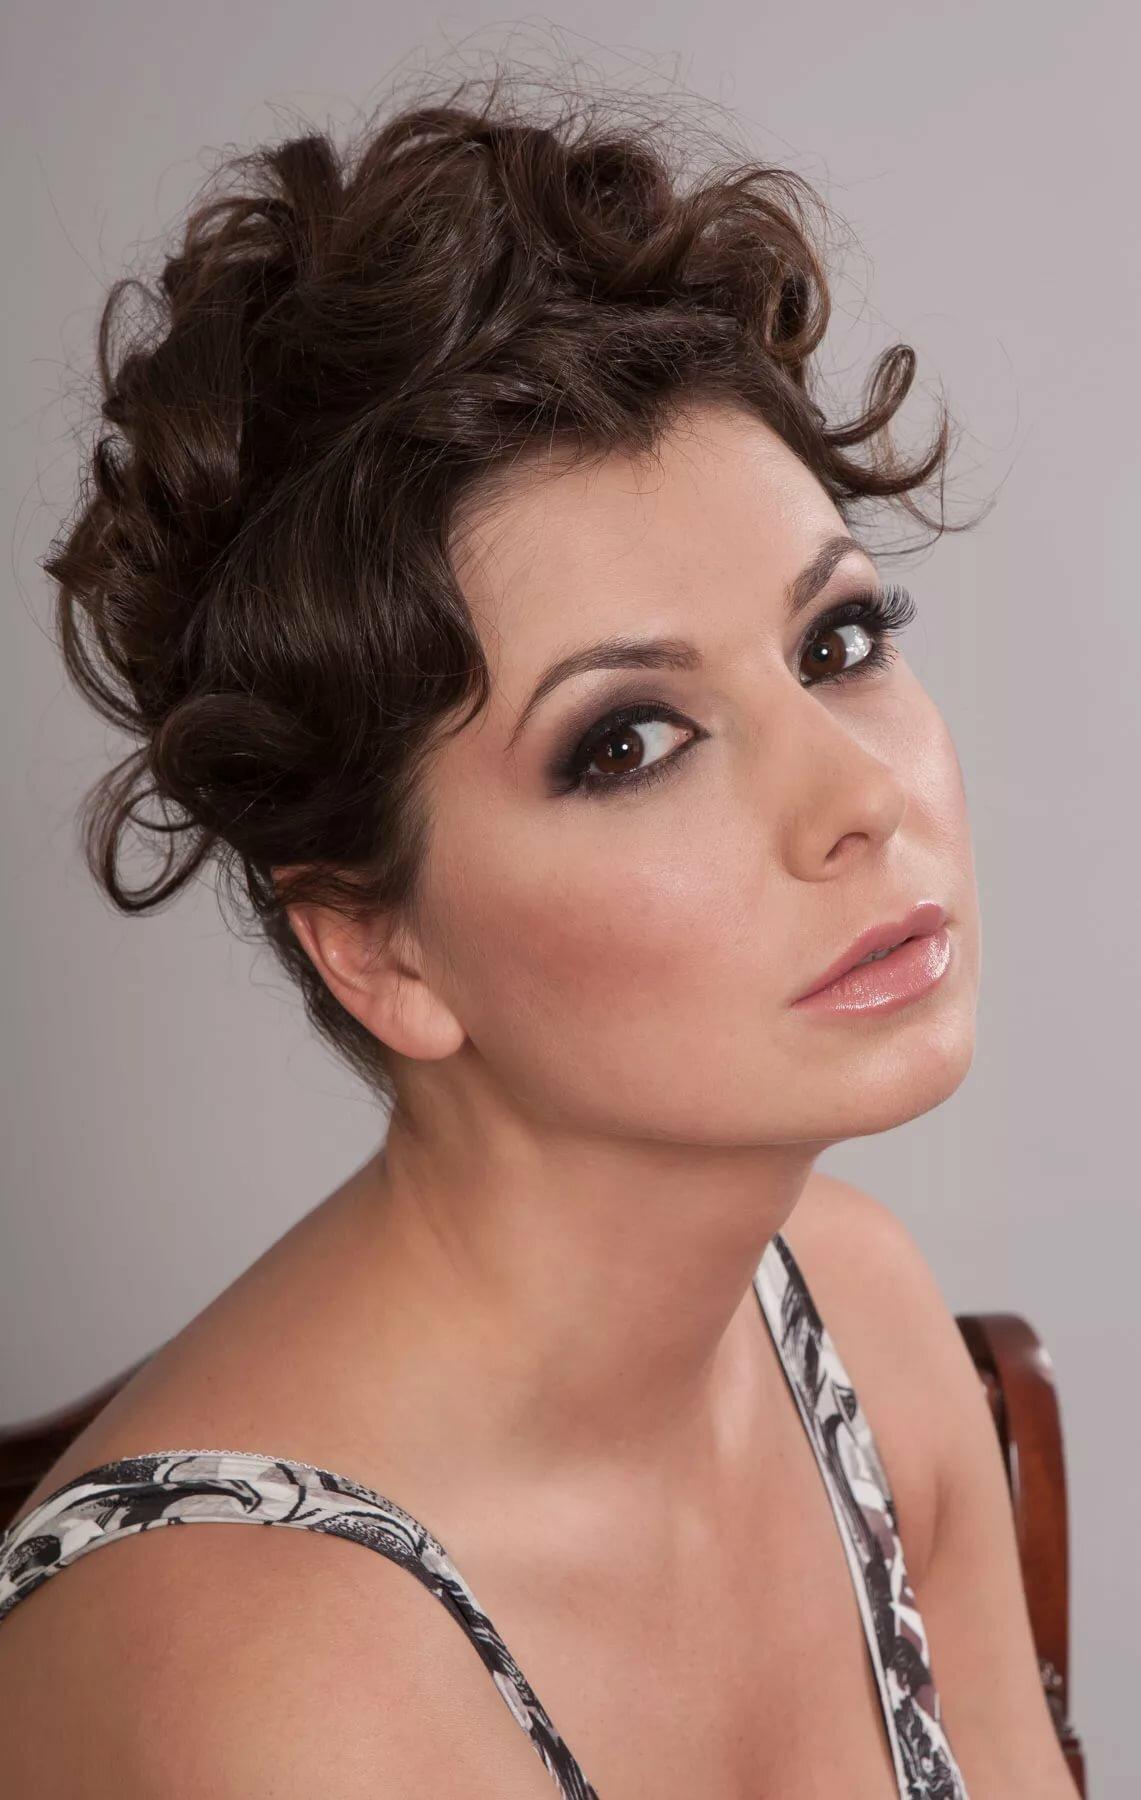 актриса ирина ефремова биография фото спасибо большое отзыв